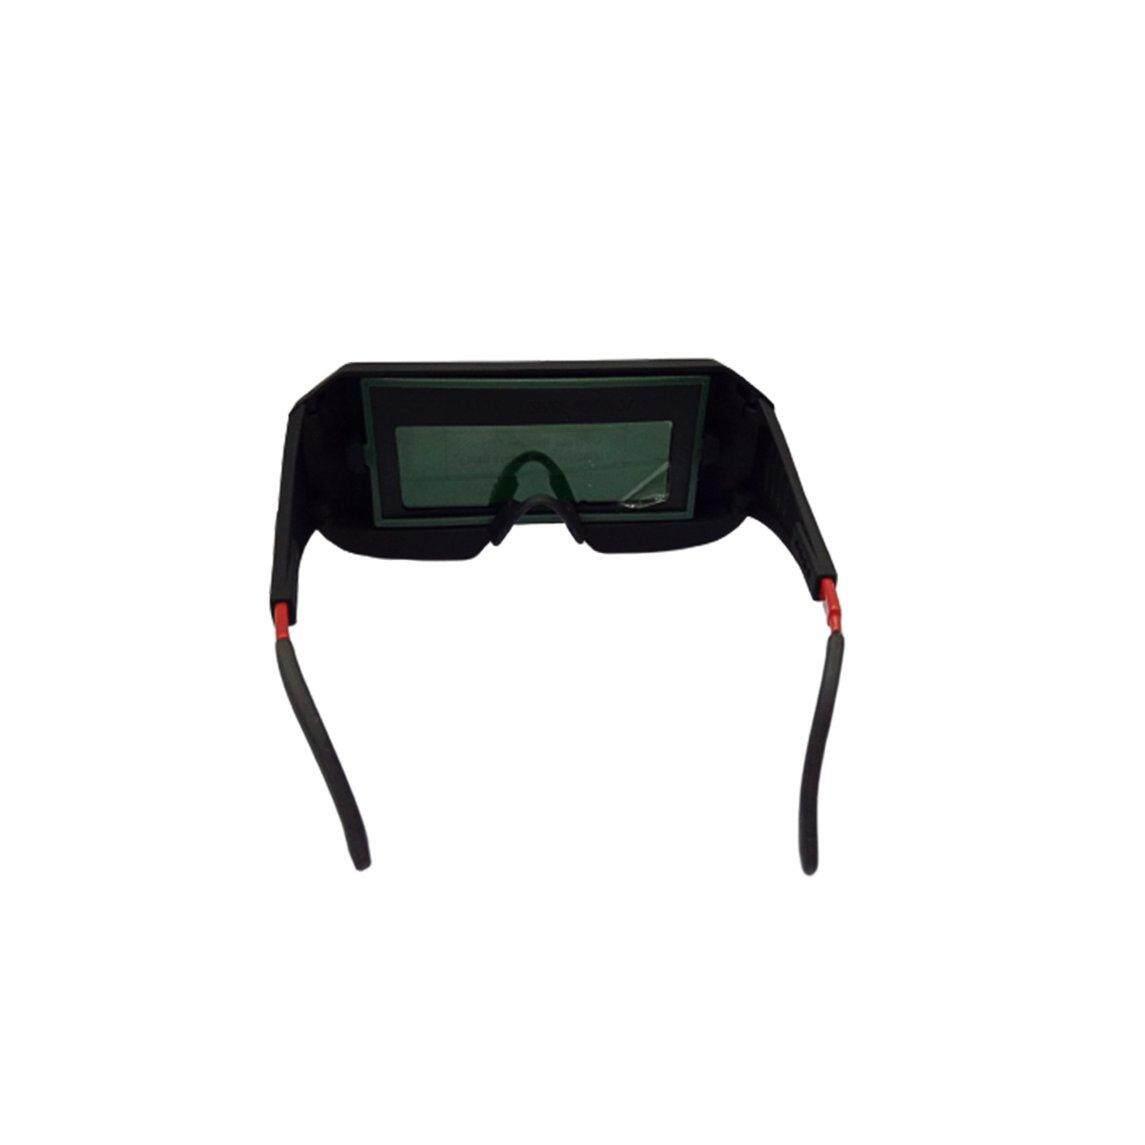 Crazy Sale Welding Glasses Automatic Dimming Argon Arc Welding Solar Welding Goggles